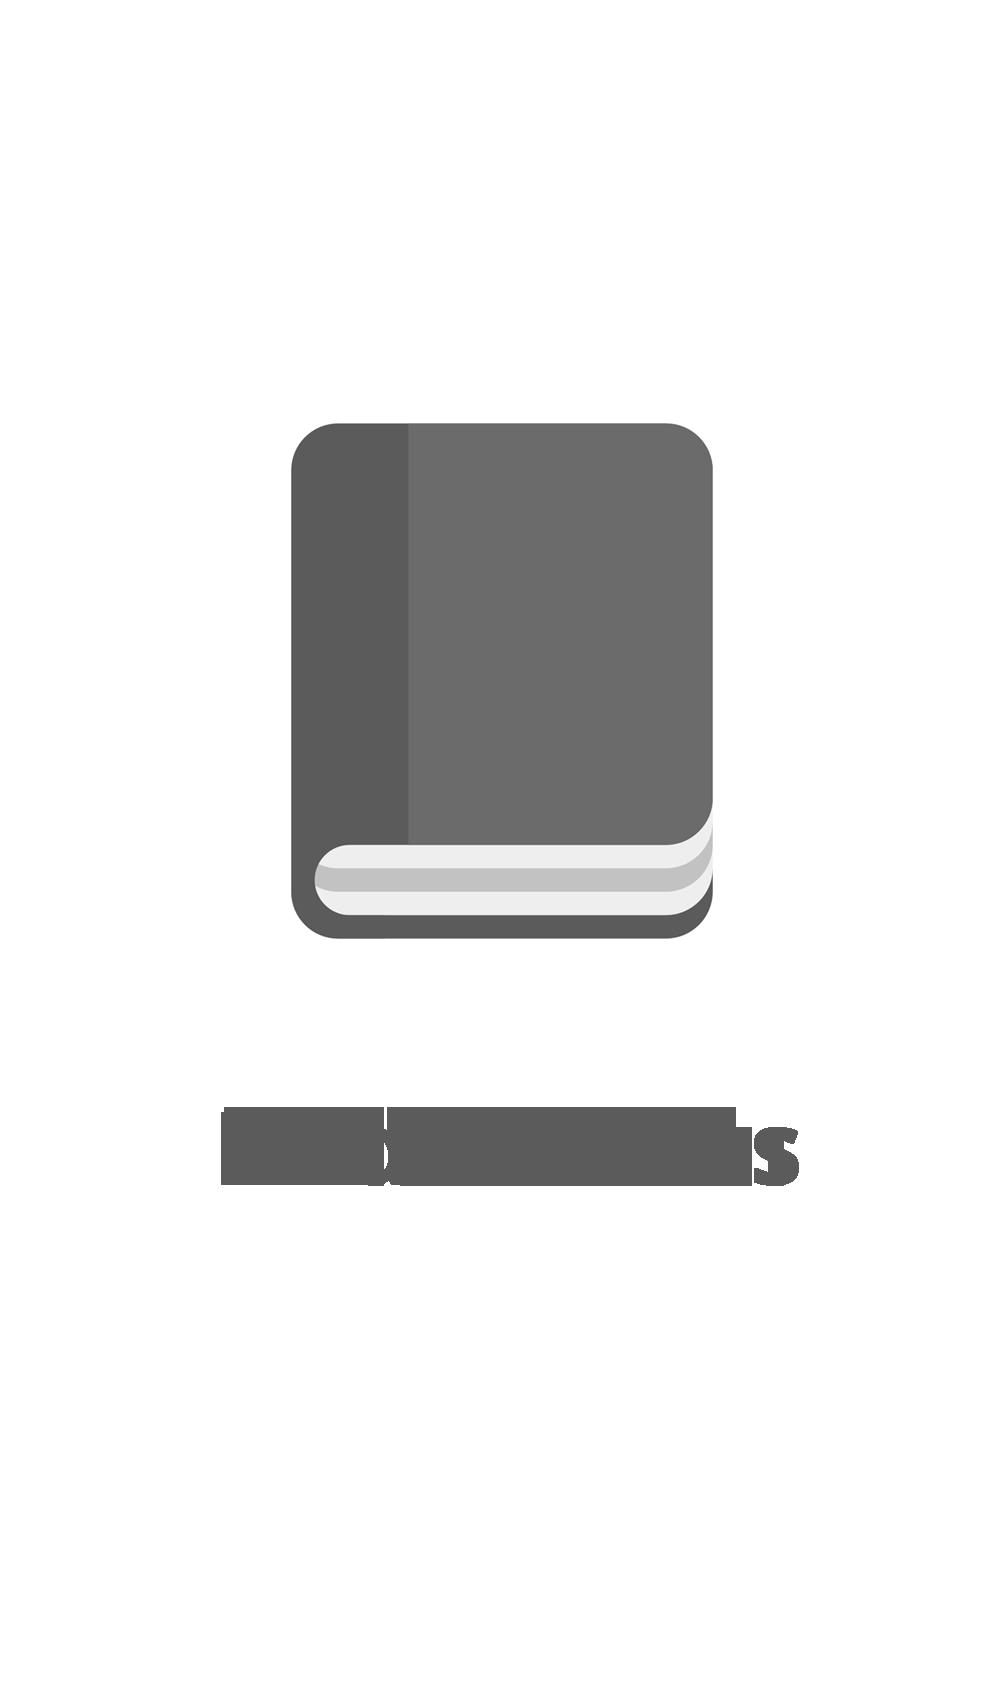 Sticker Display - Cardboard